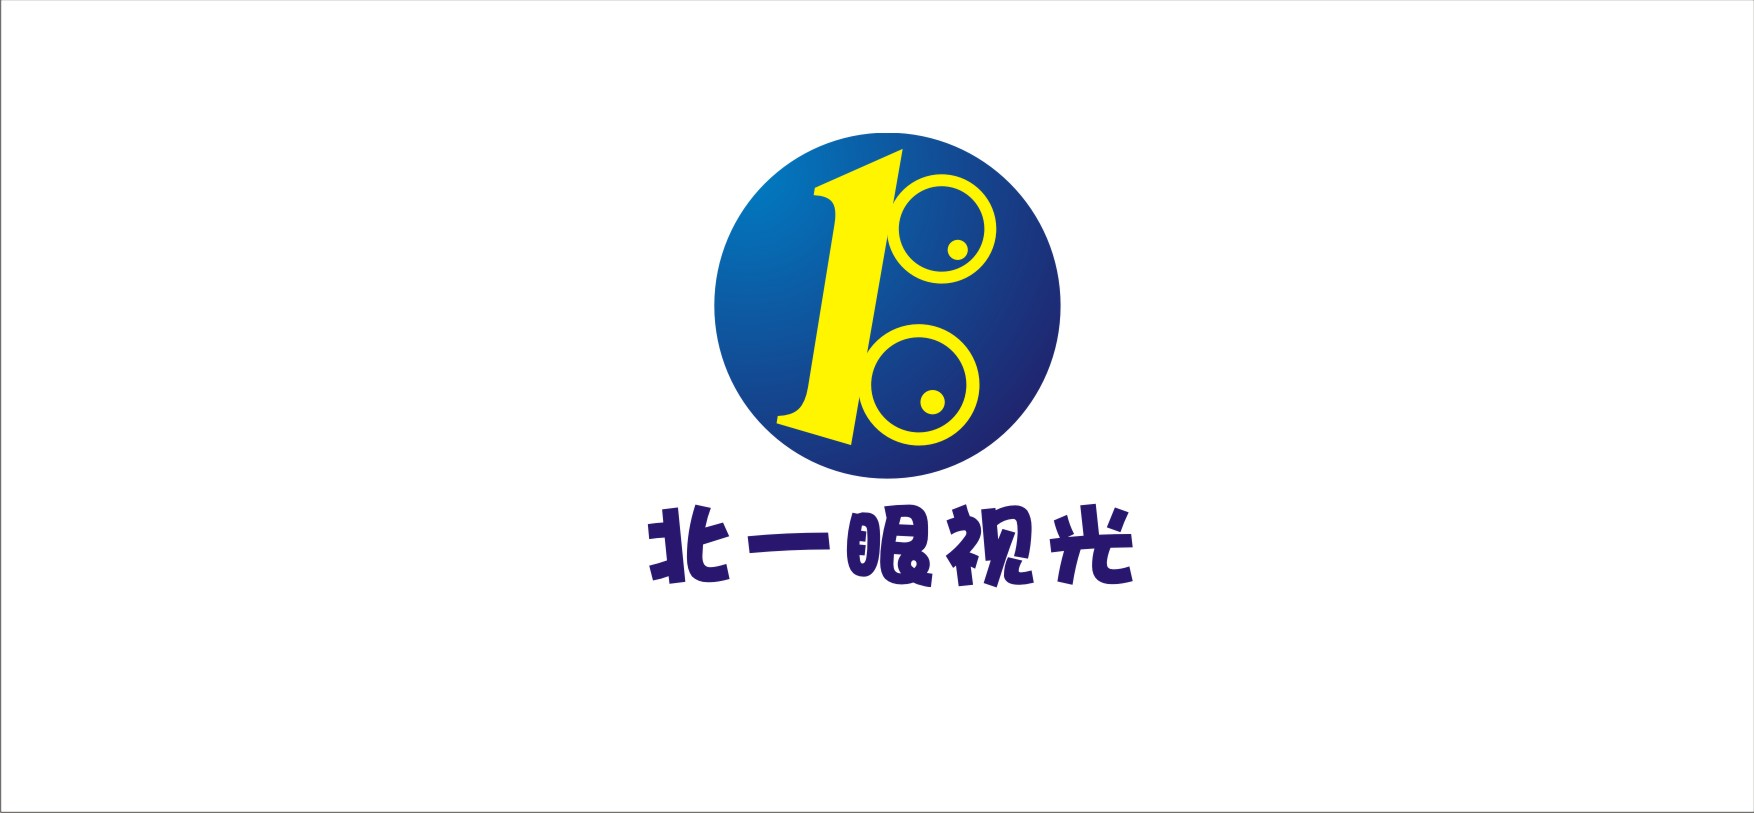 北一眼视光logo设计